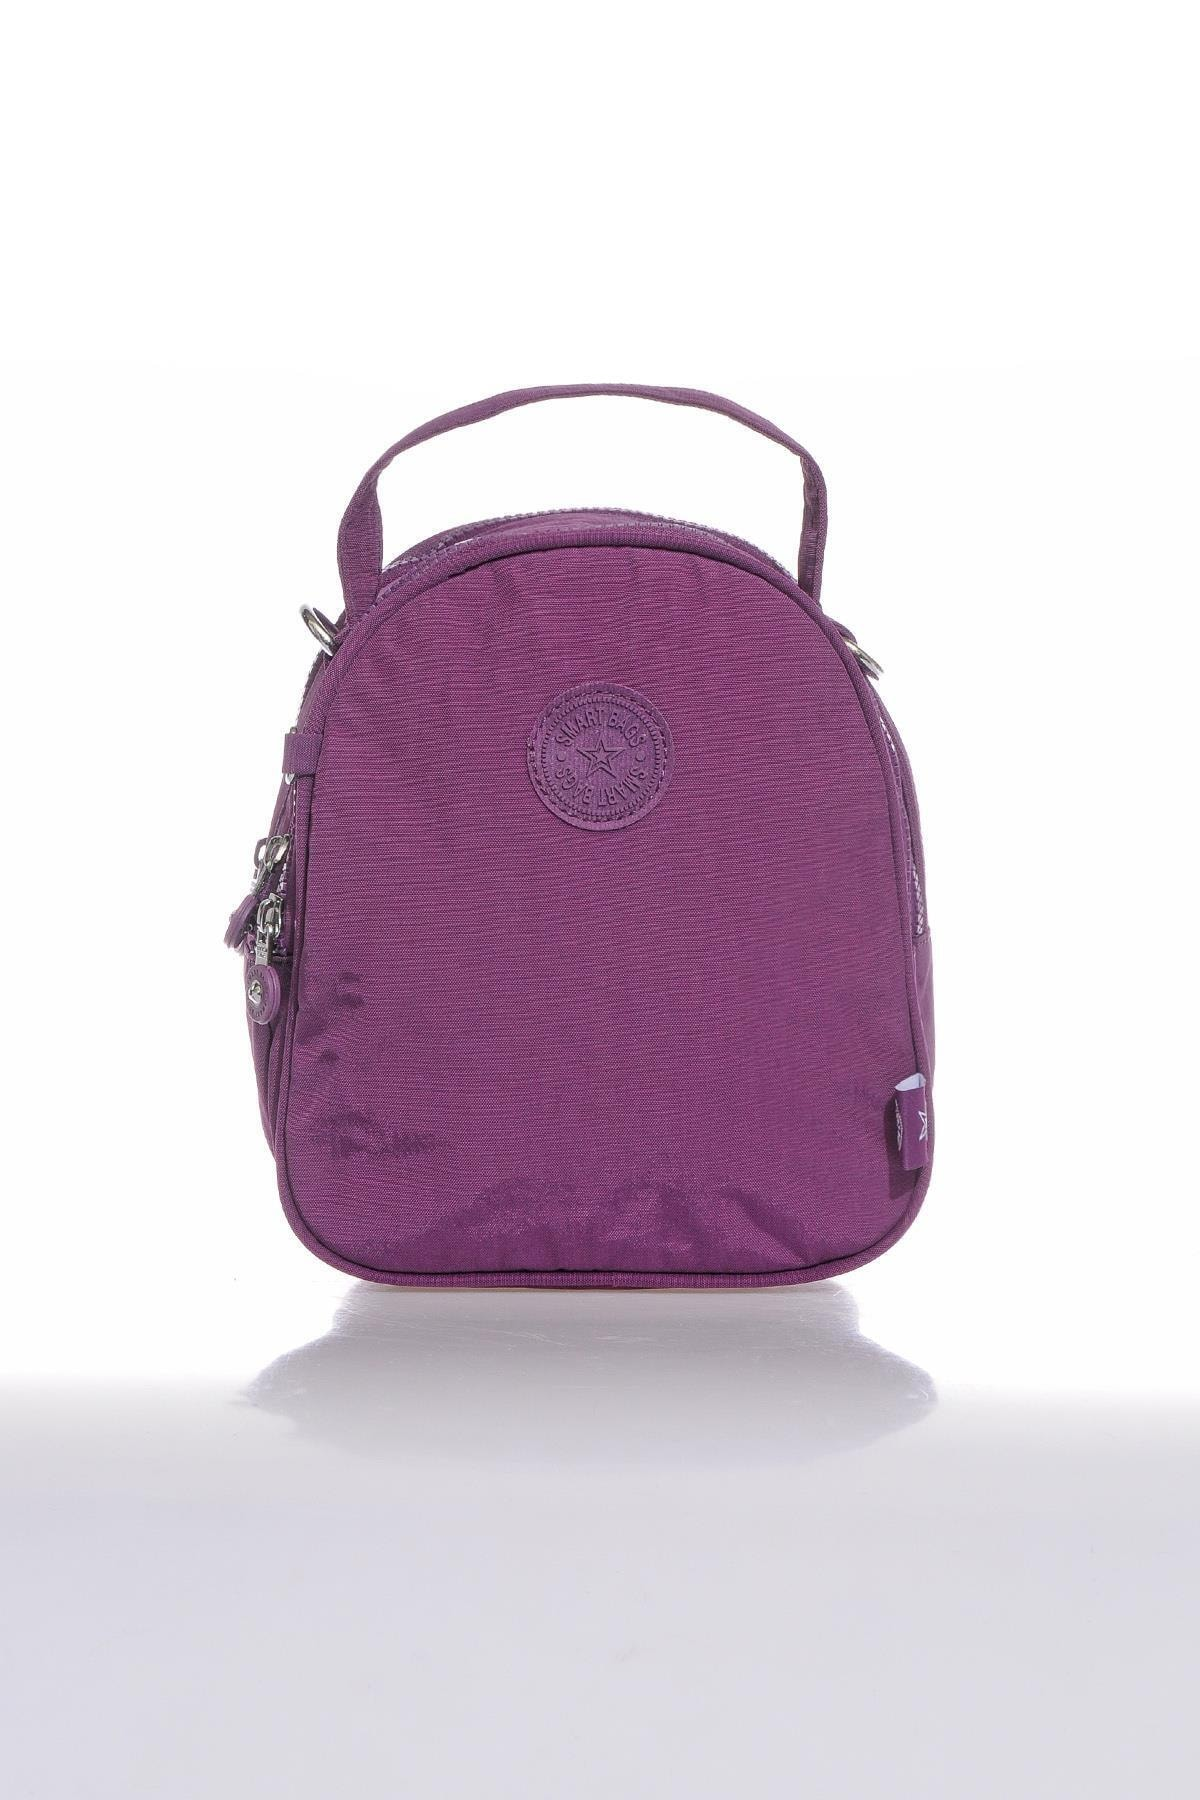 SMART BAGS Smb3063-0027 Mor Kadın Sırt Çantası 1